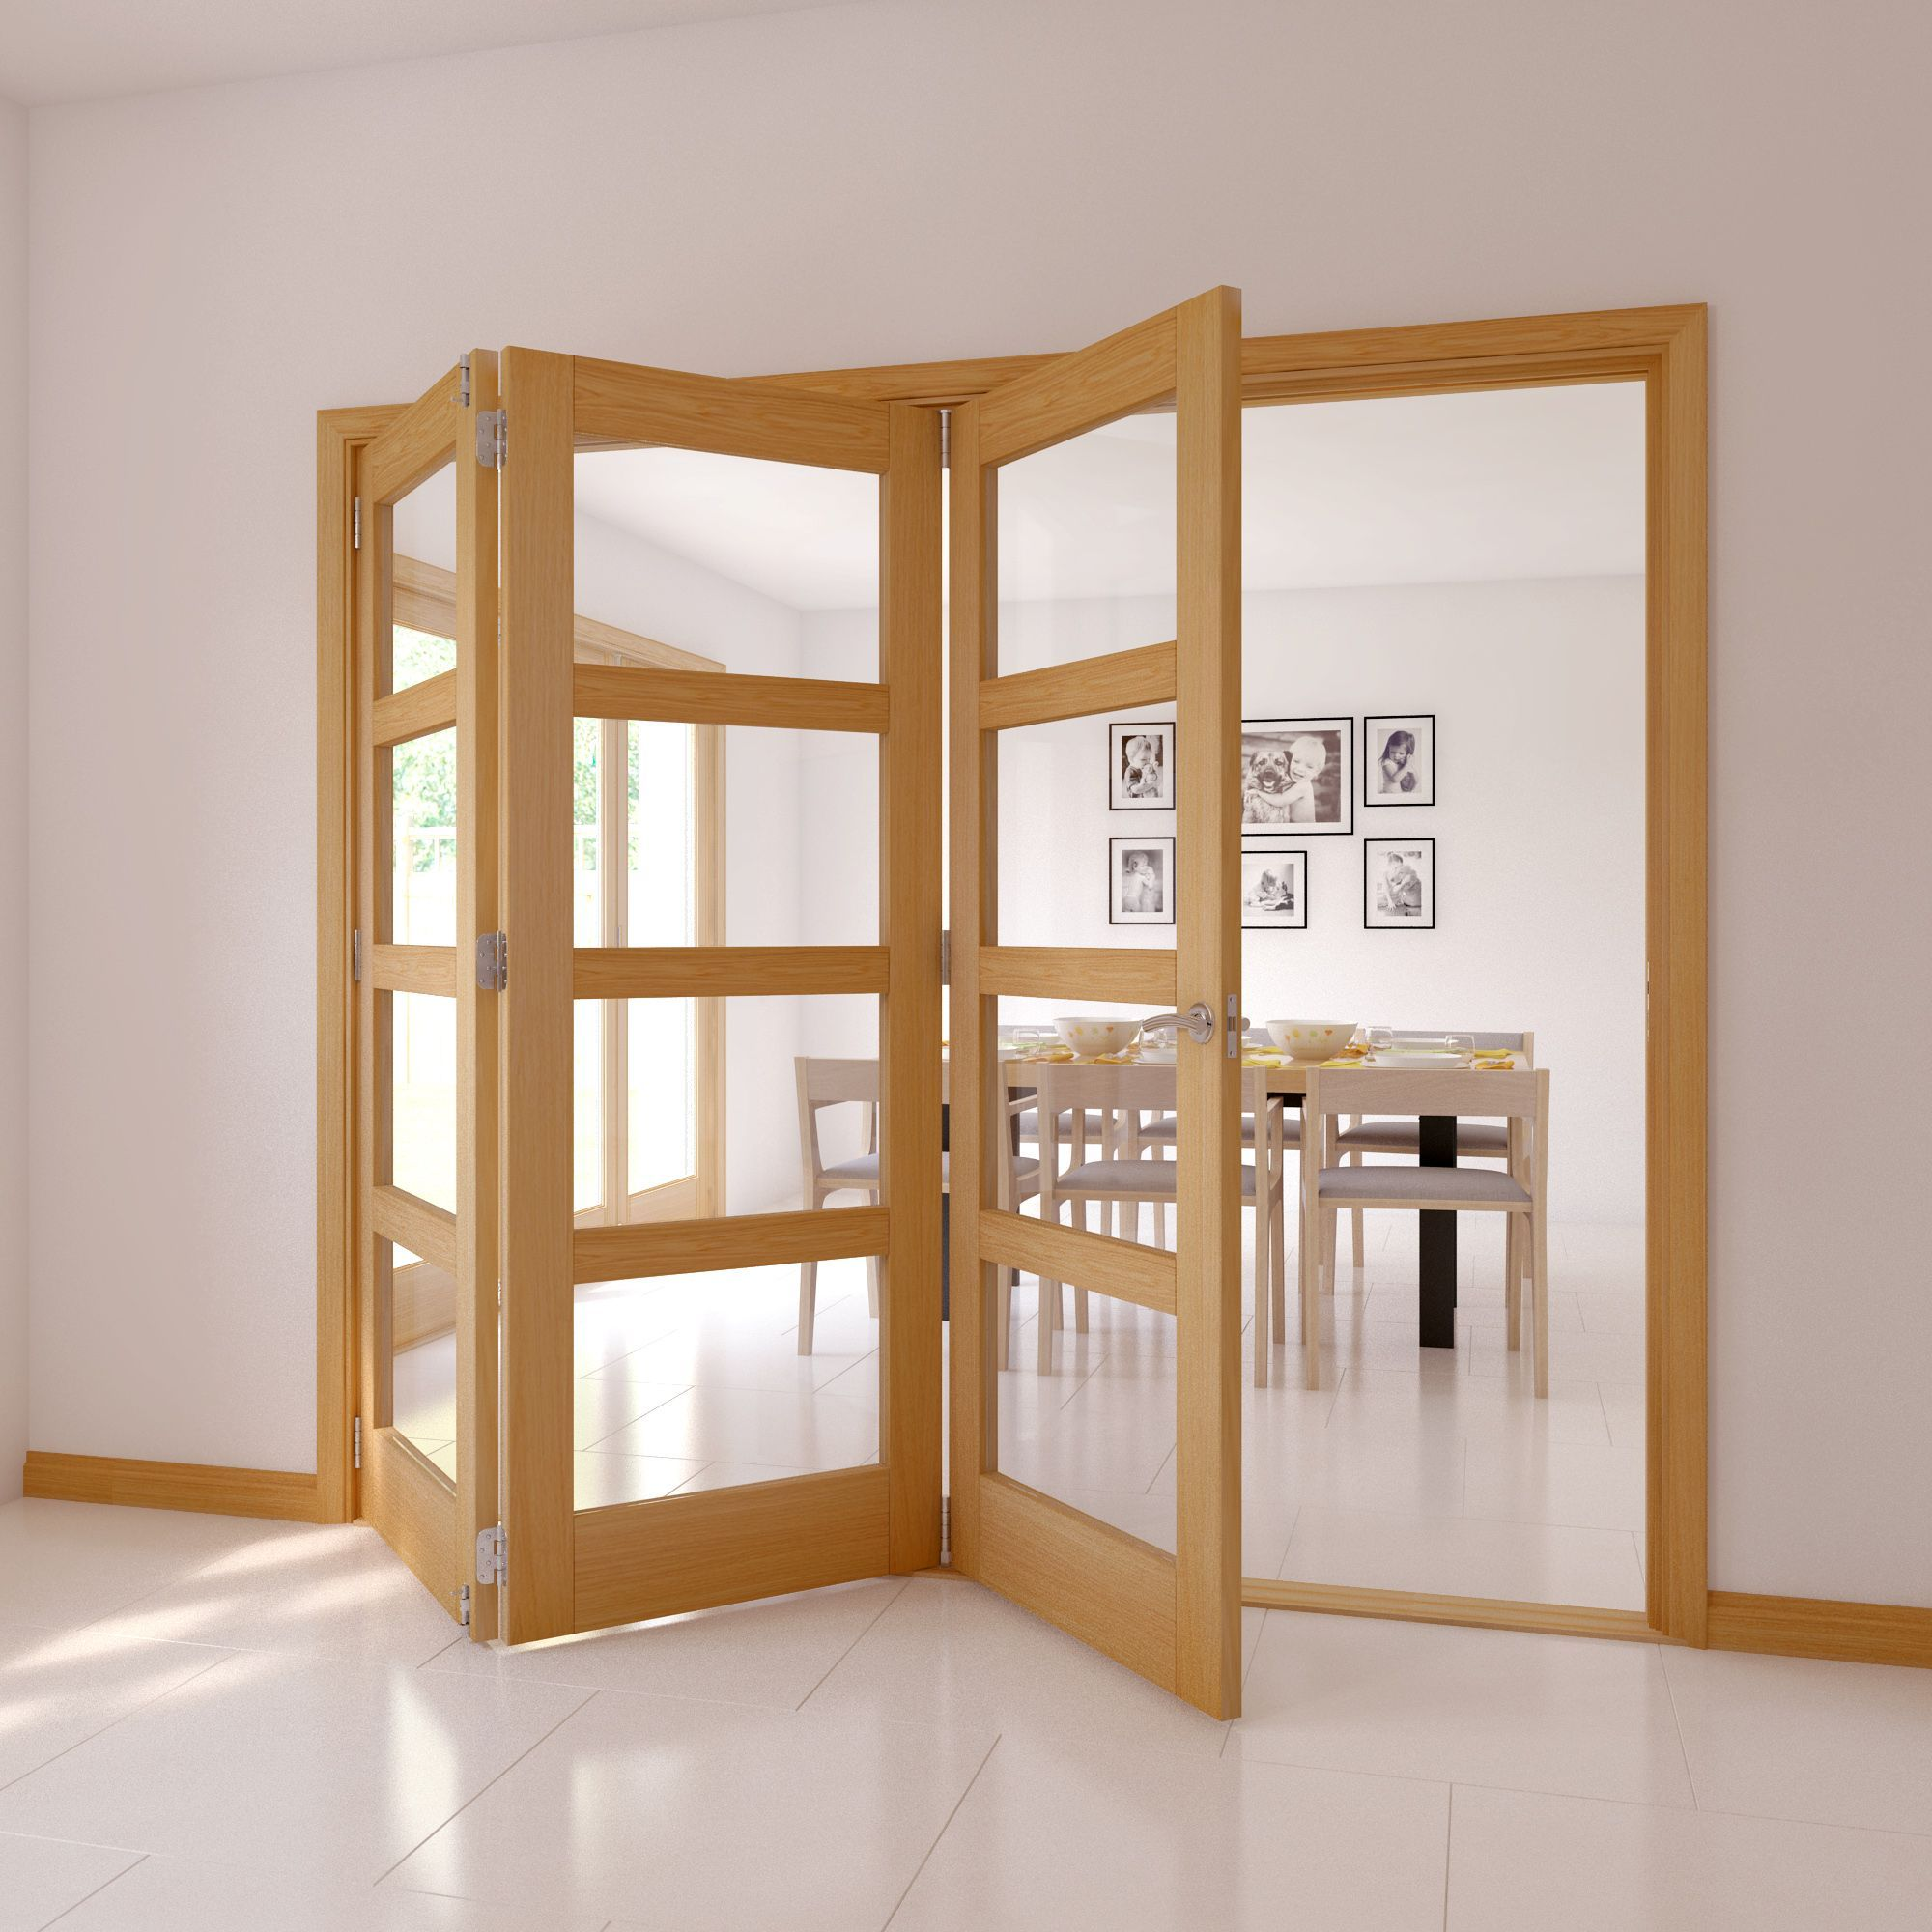 4 Panel 4 Lite Oak Veneer Glazed Internal Trifold Door H 2035mm W 2374mm Departments Diy At B Q Internal Folding Doors Folding Doors Internal Doors